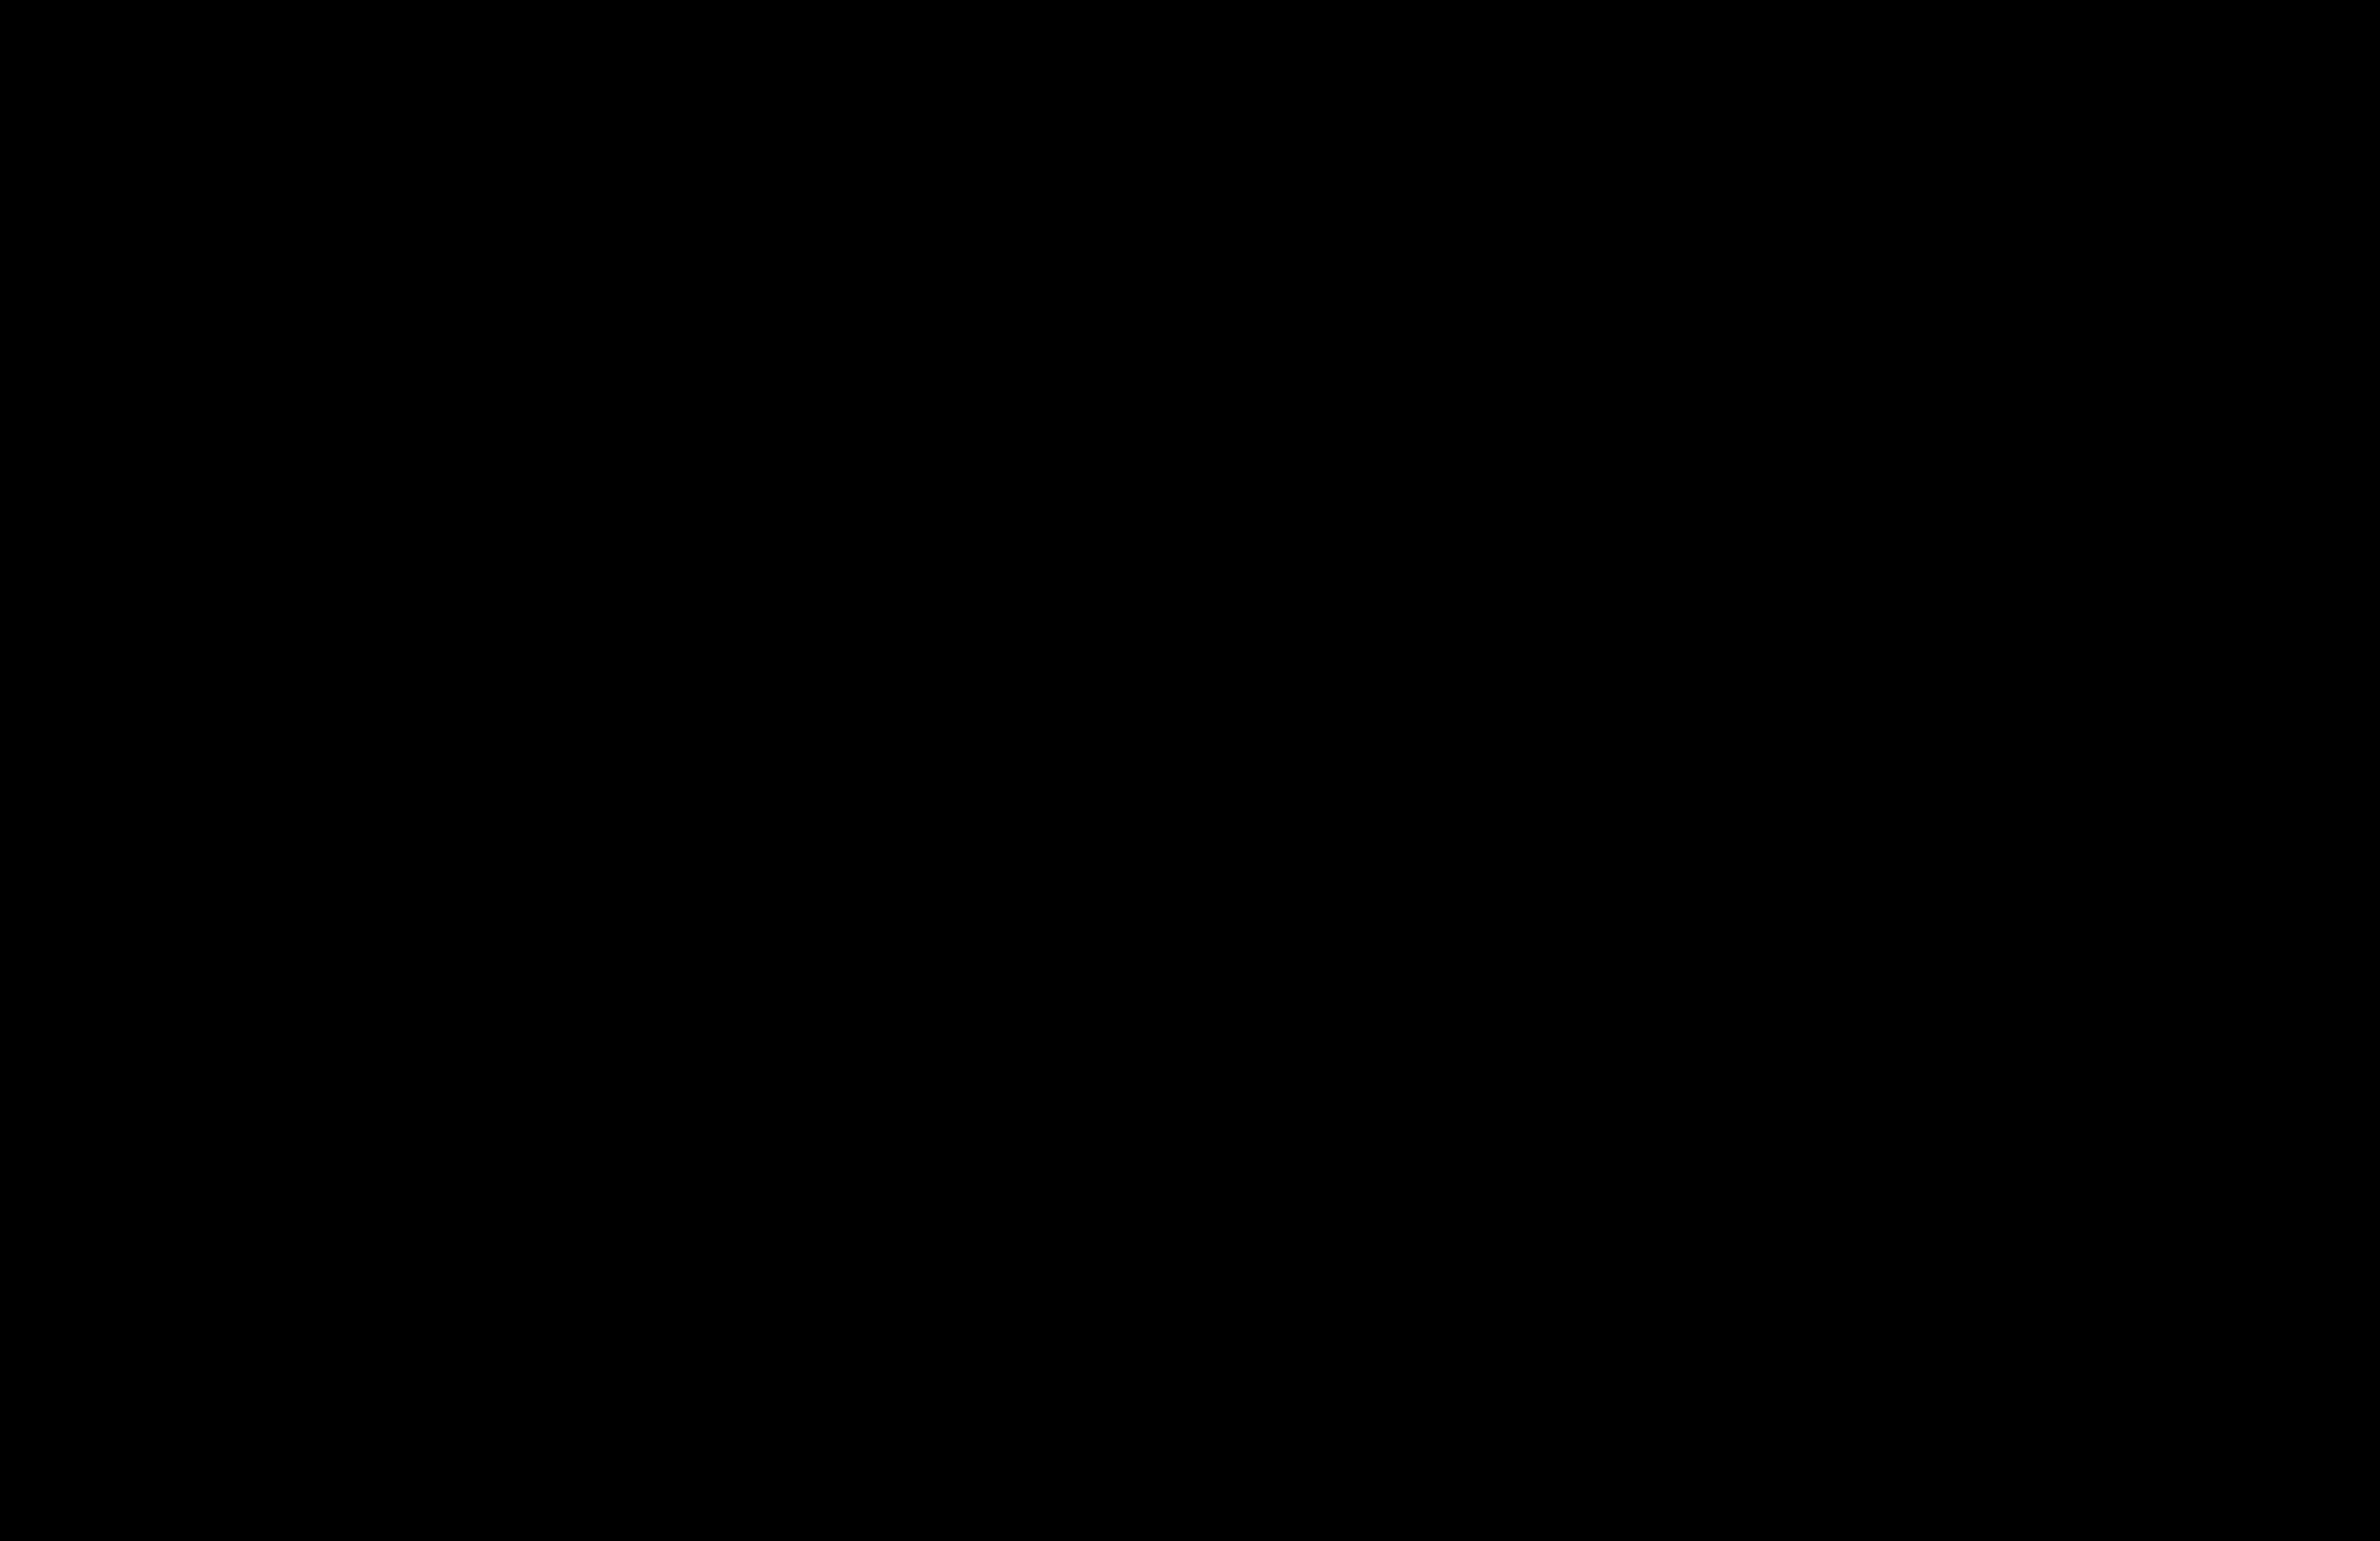 BIG IMAGE (PNG) - Barko PNG